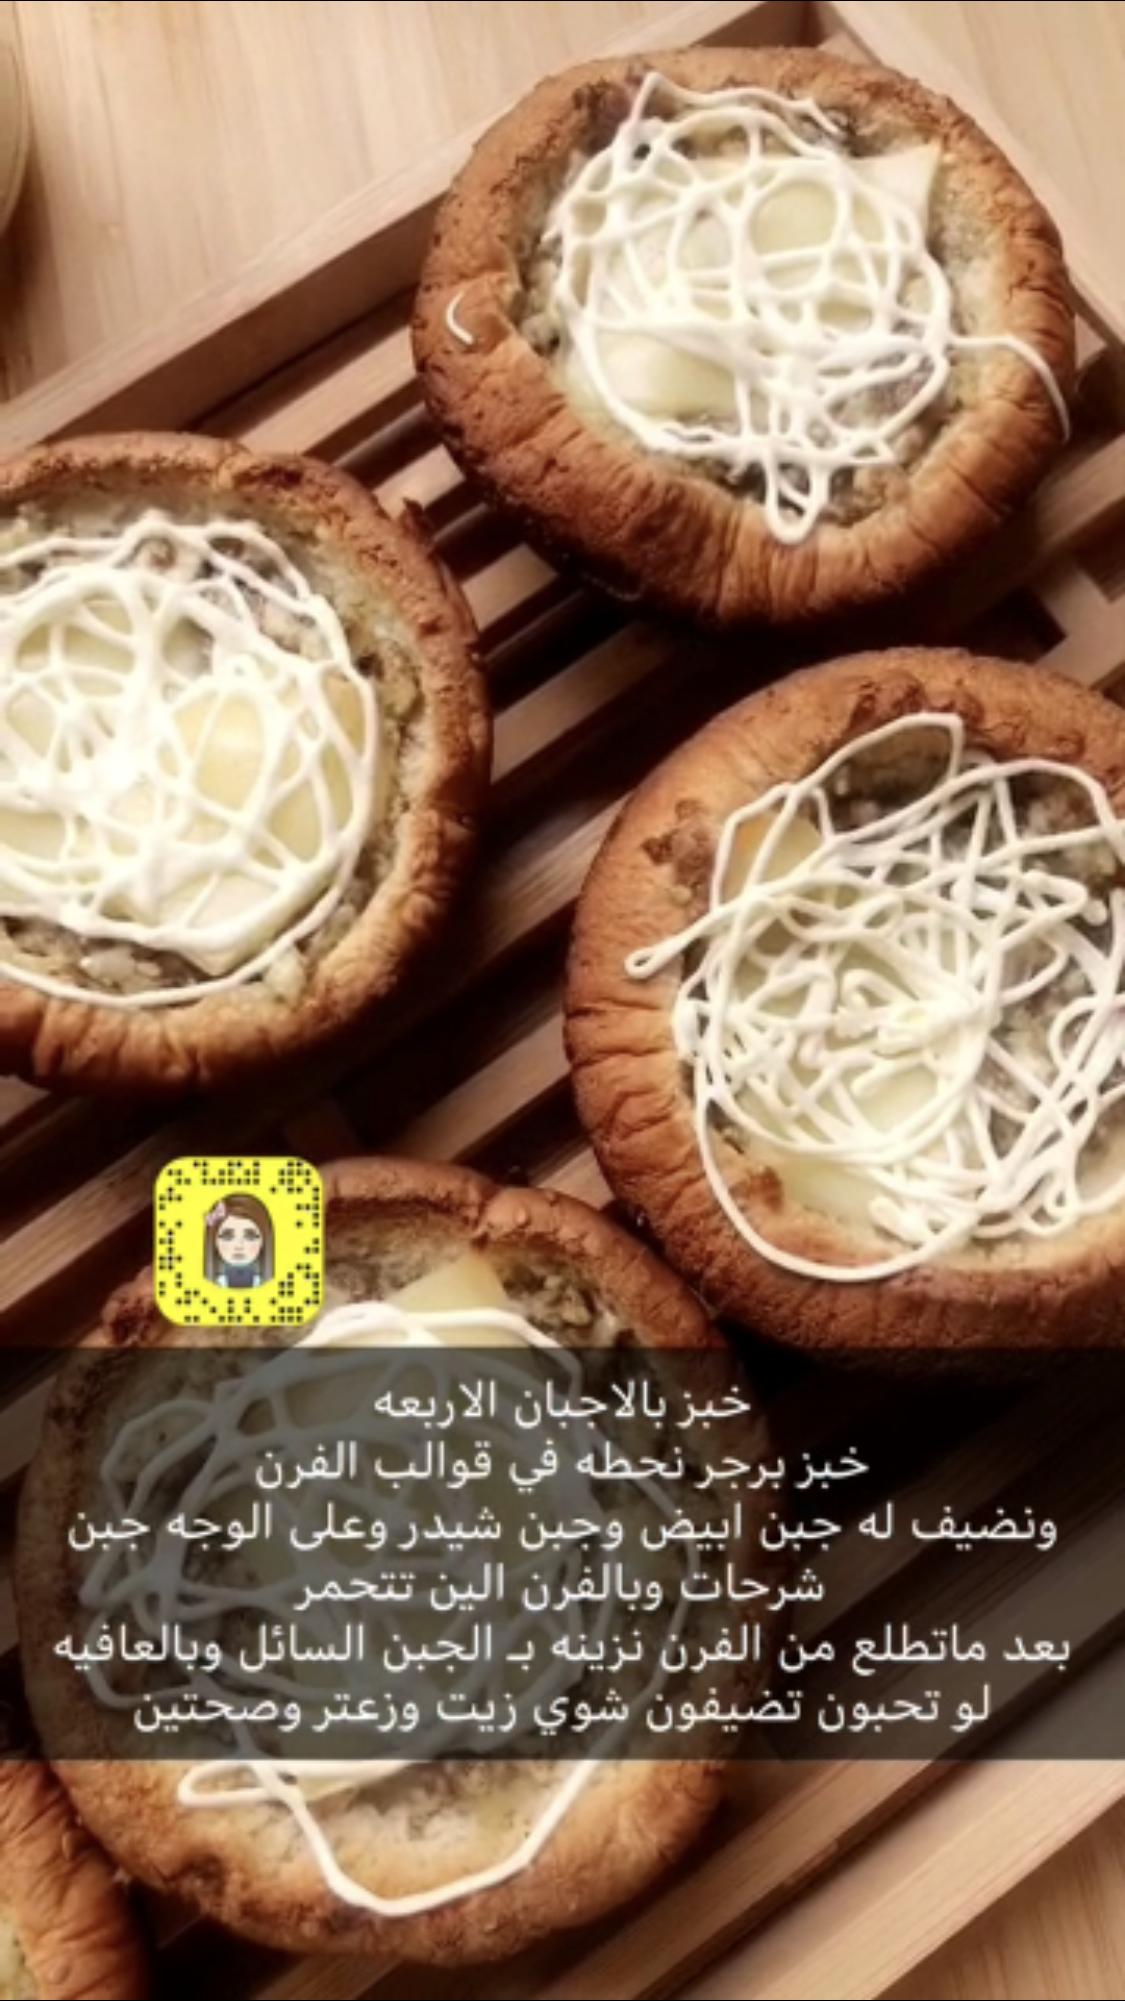 Pin By نوديتا Noodyta On سناب نوديتا Food Desserts Bread